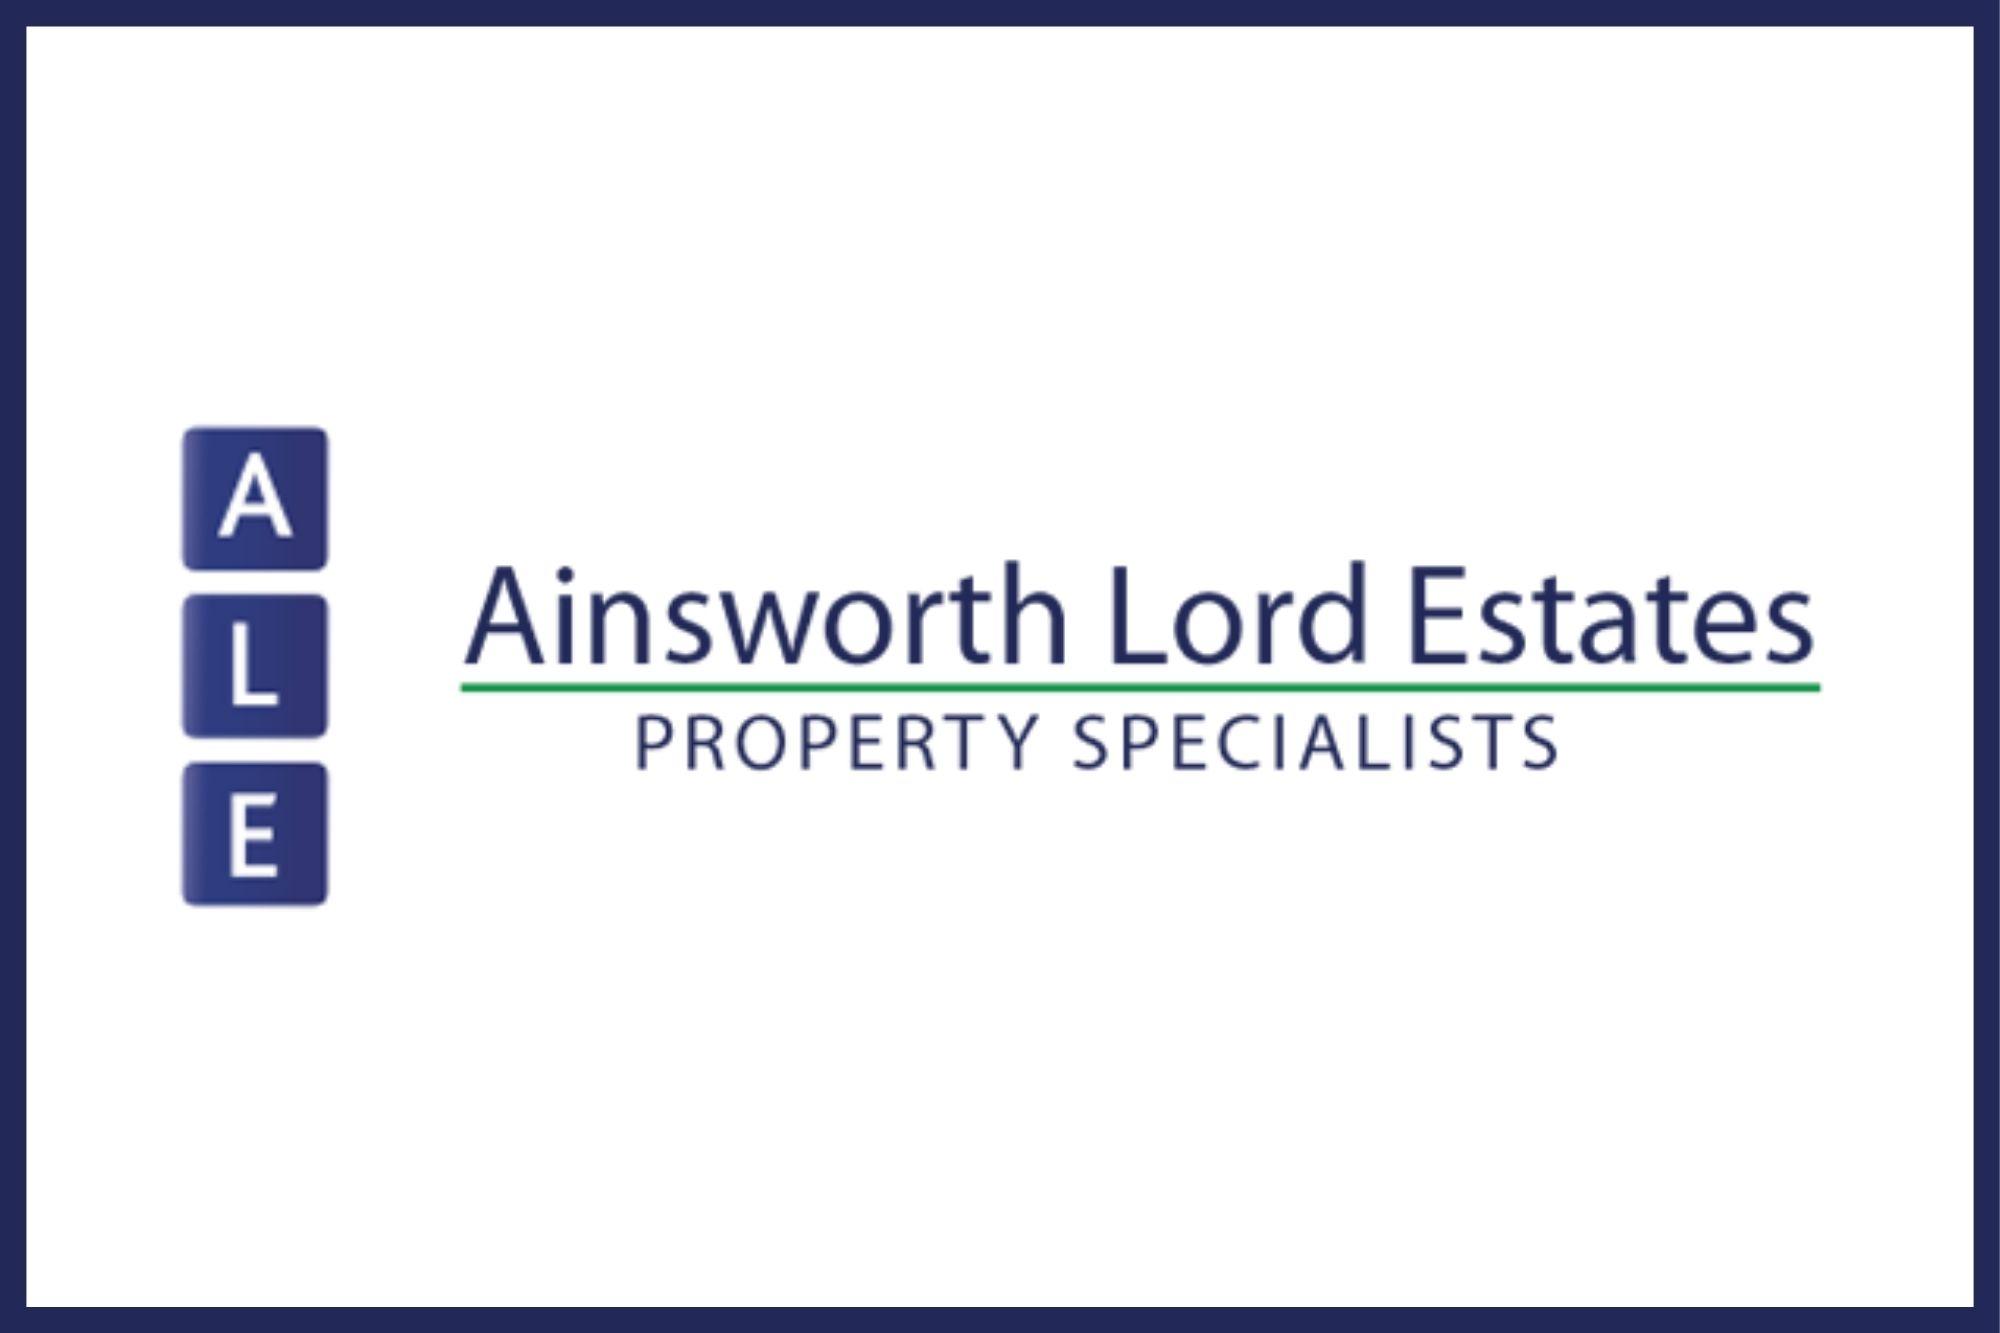 Ainsworth Lord estates